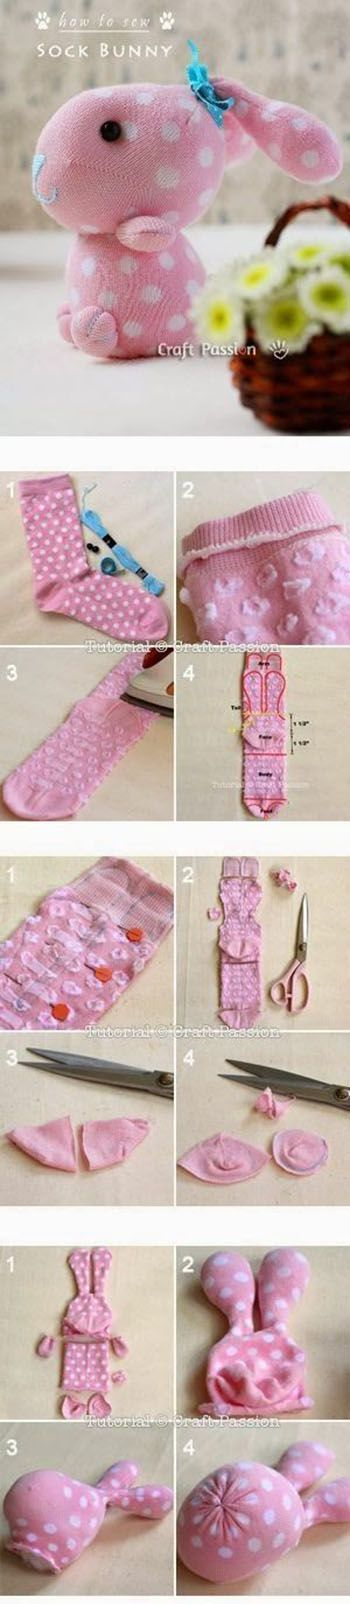 Diy Cute Sock Bunny   DIY & Crafts Tutorials   orhan   Pinterest